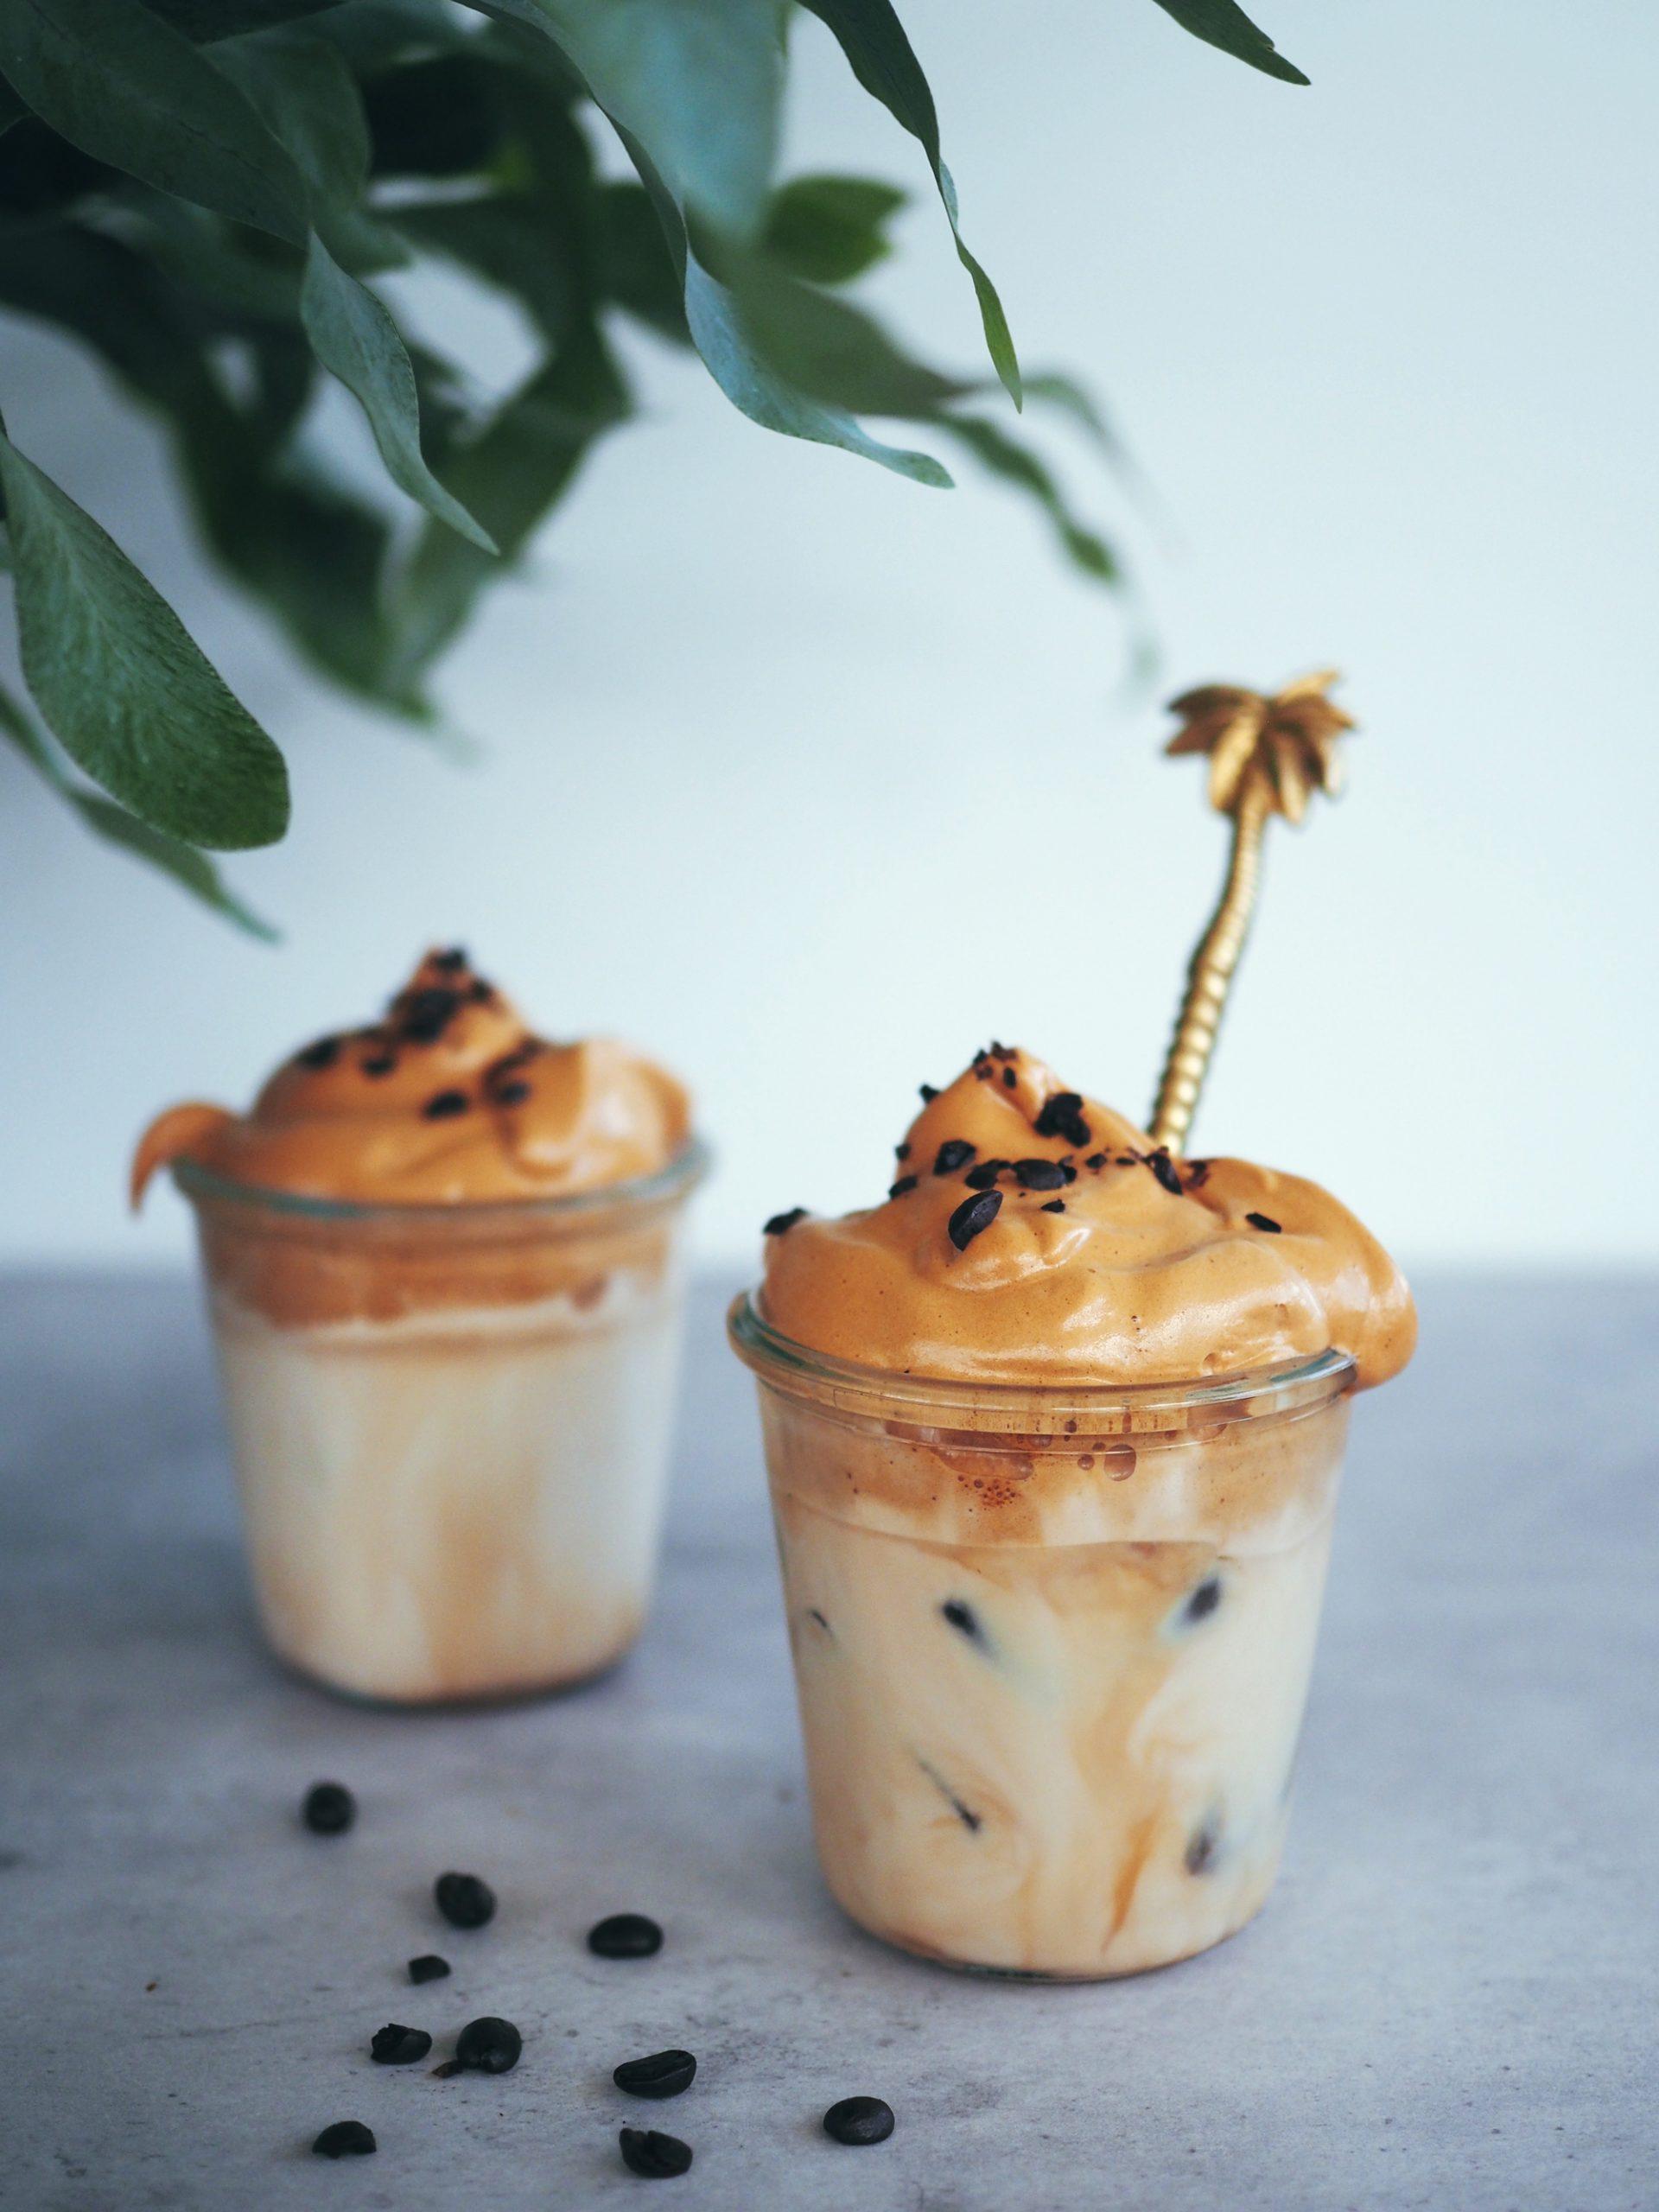 Sockerfritt dalgona-kaffe